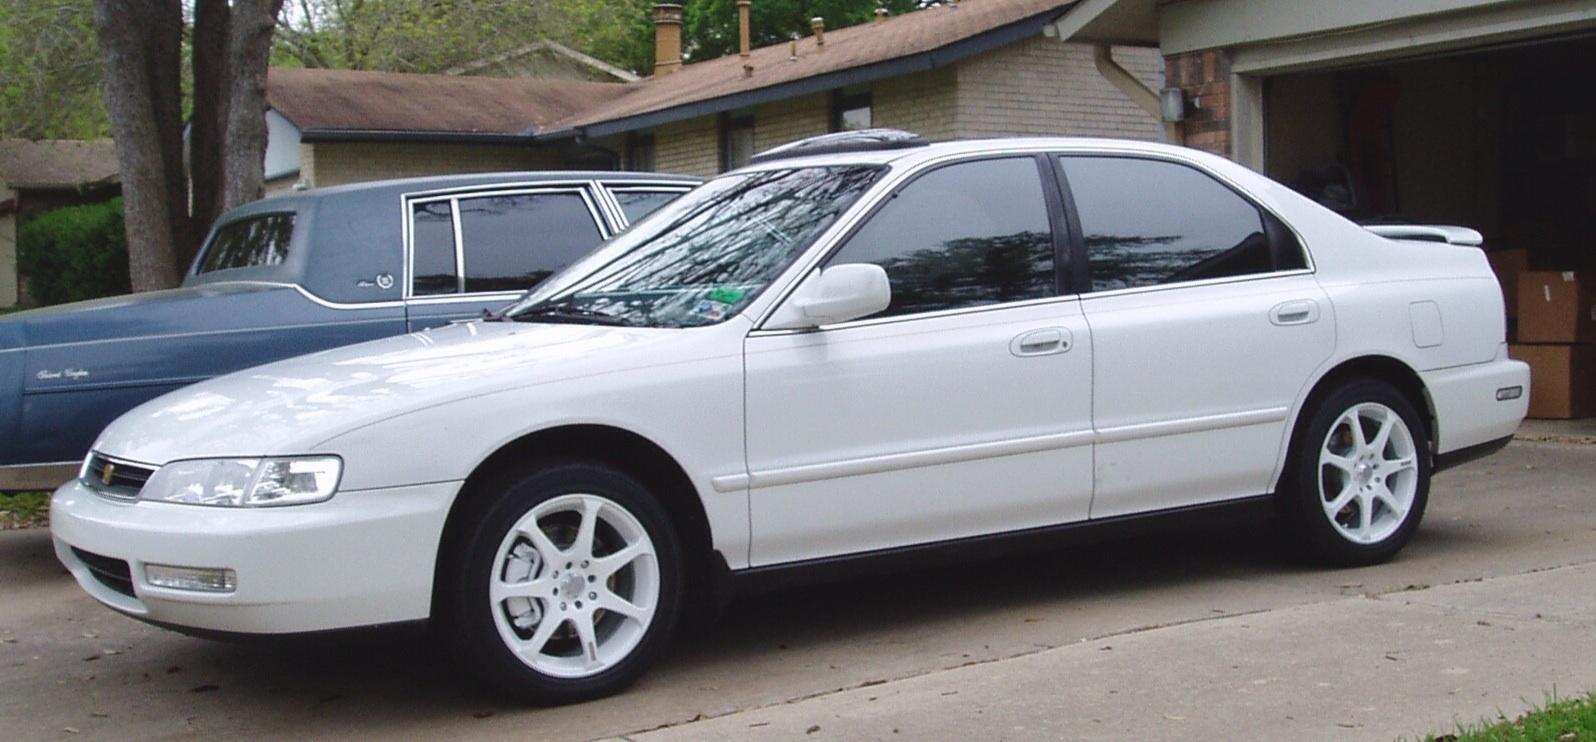 1996 Honda Accord - Overview - CarGurus